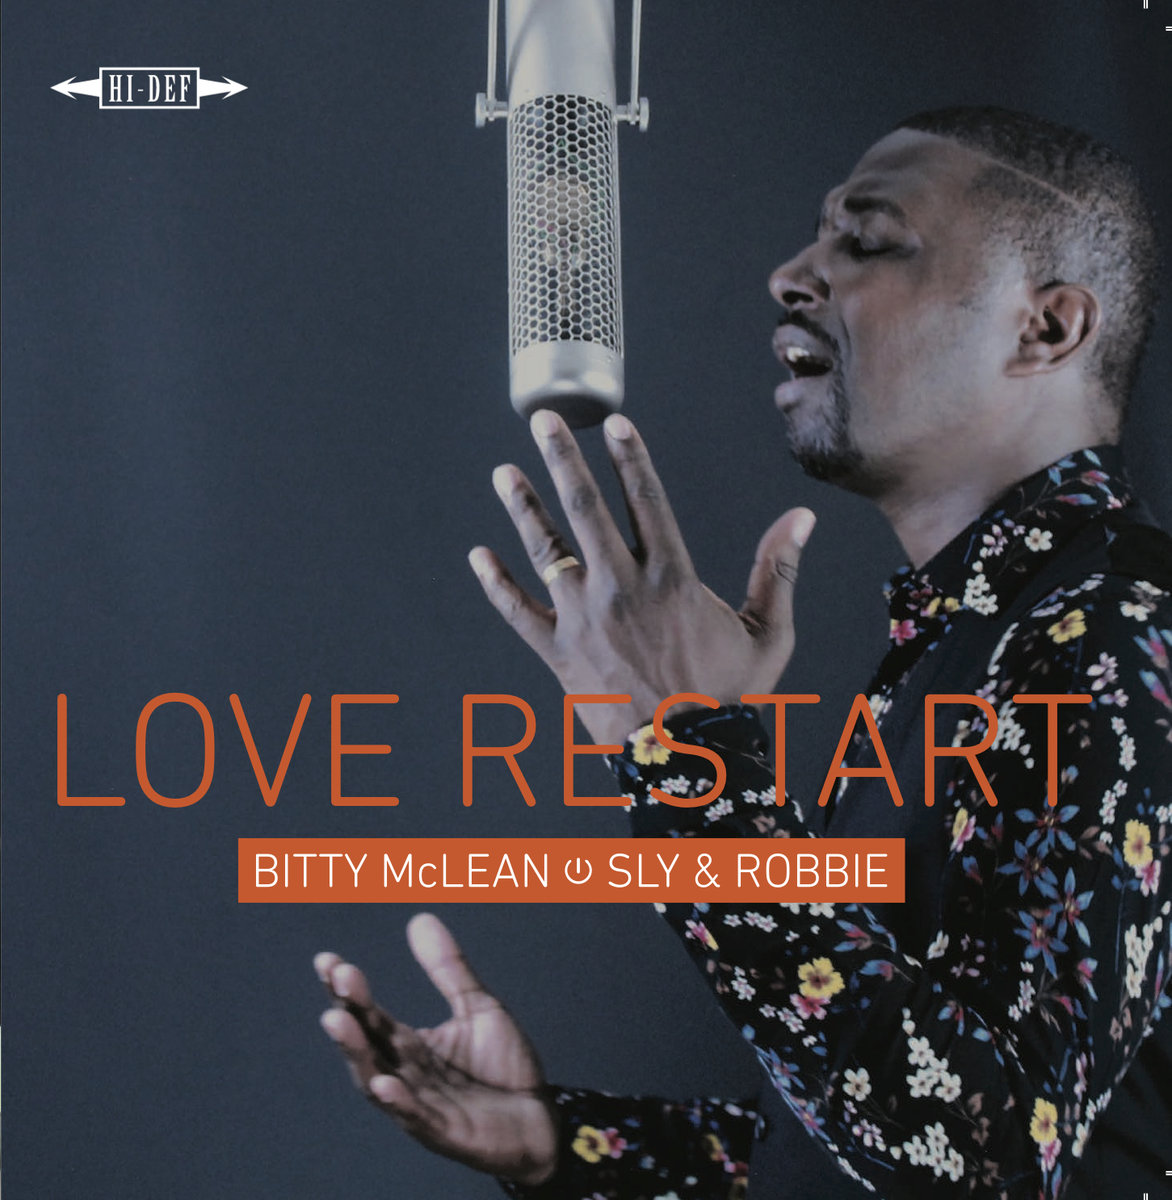 Love Restart - Bitty McLean Sly & Robbie